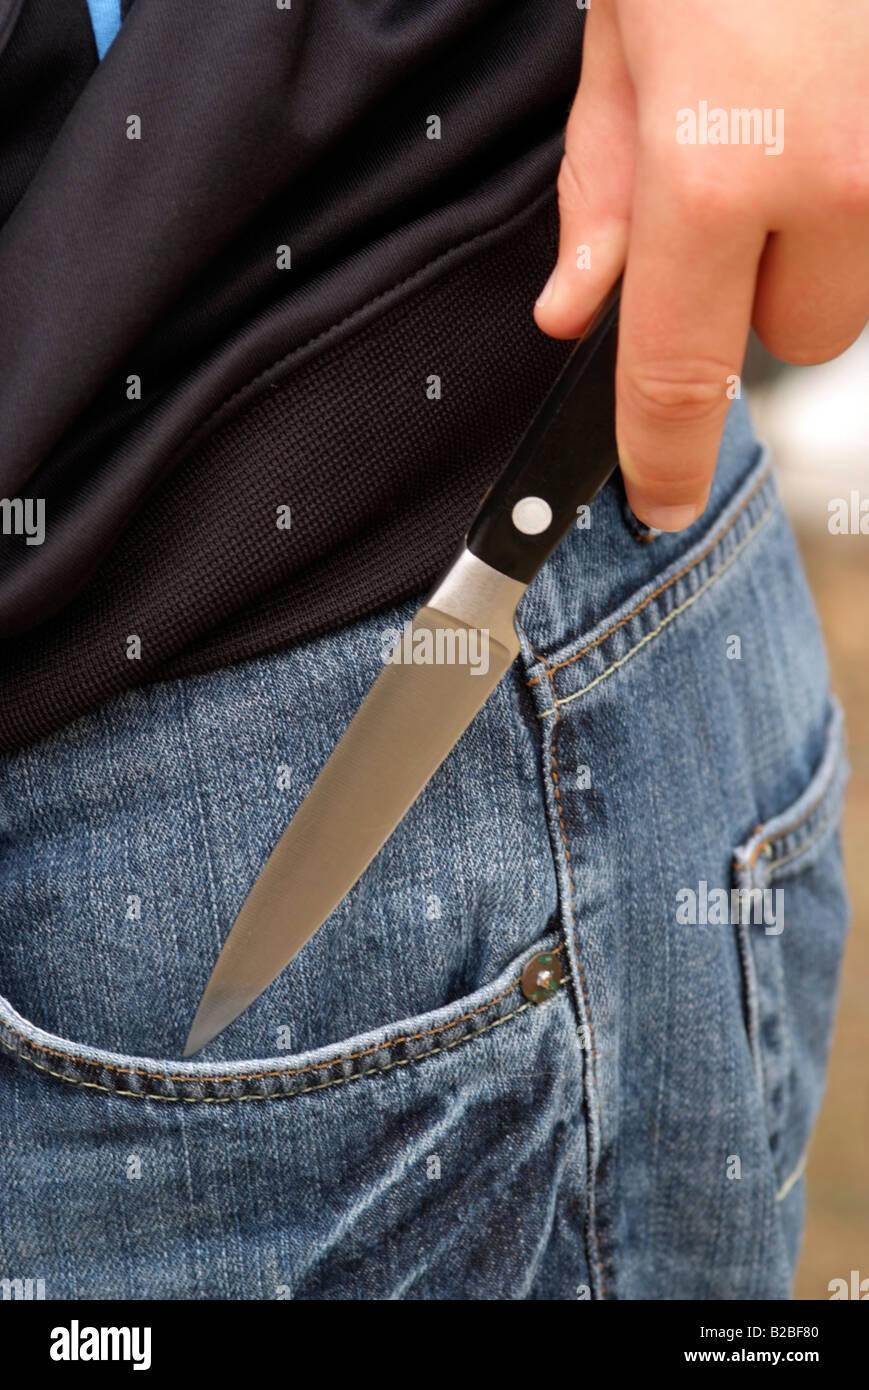 Knife crime boys hand holding a kitchen knife - Stock Image